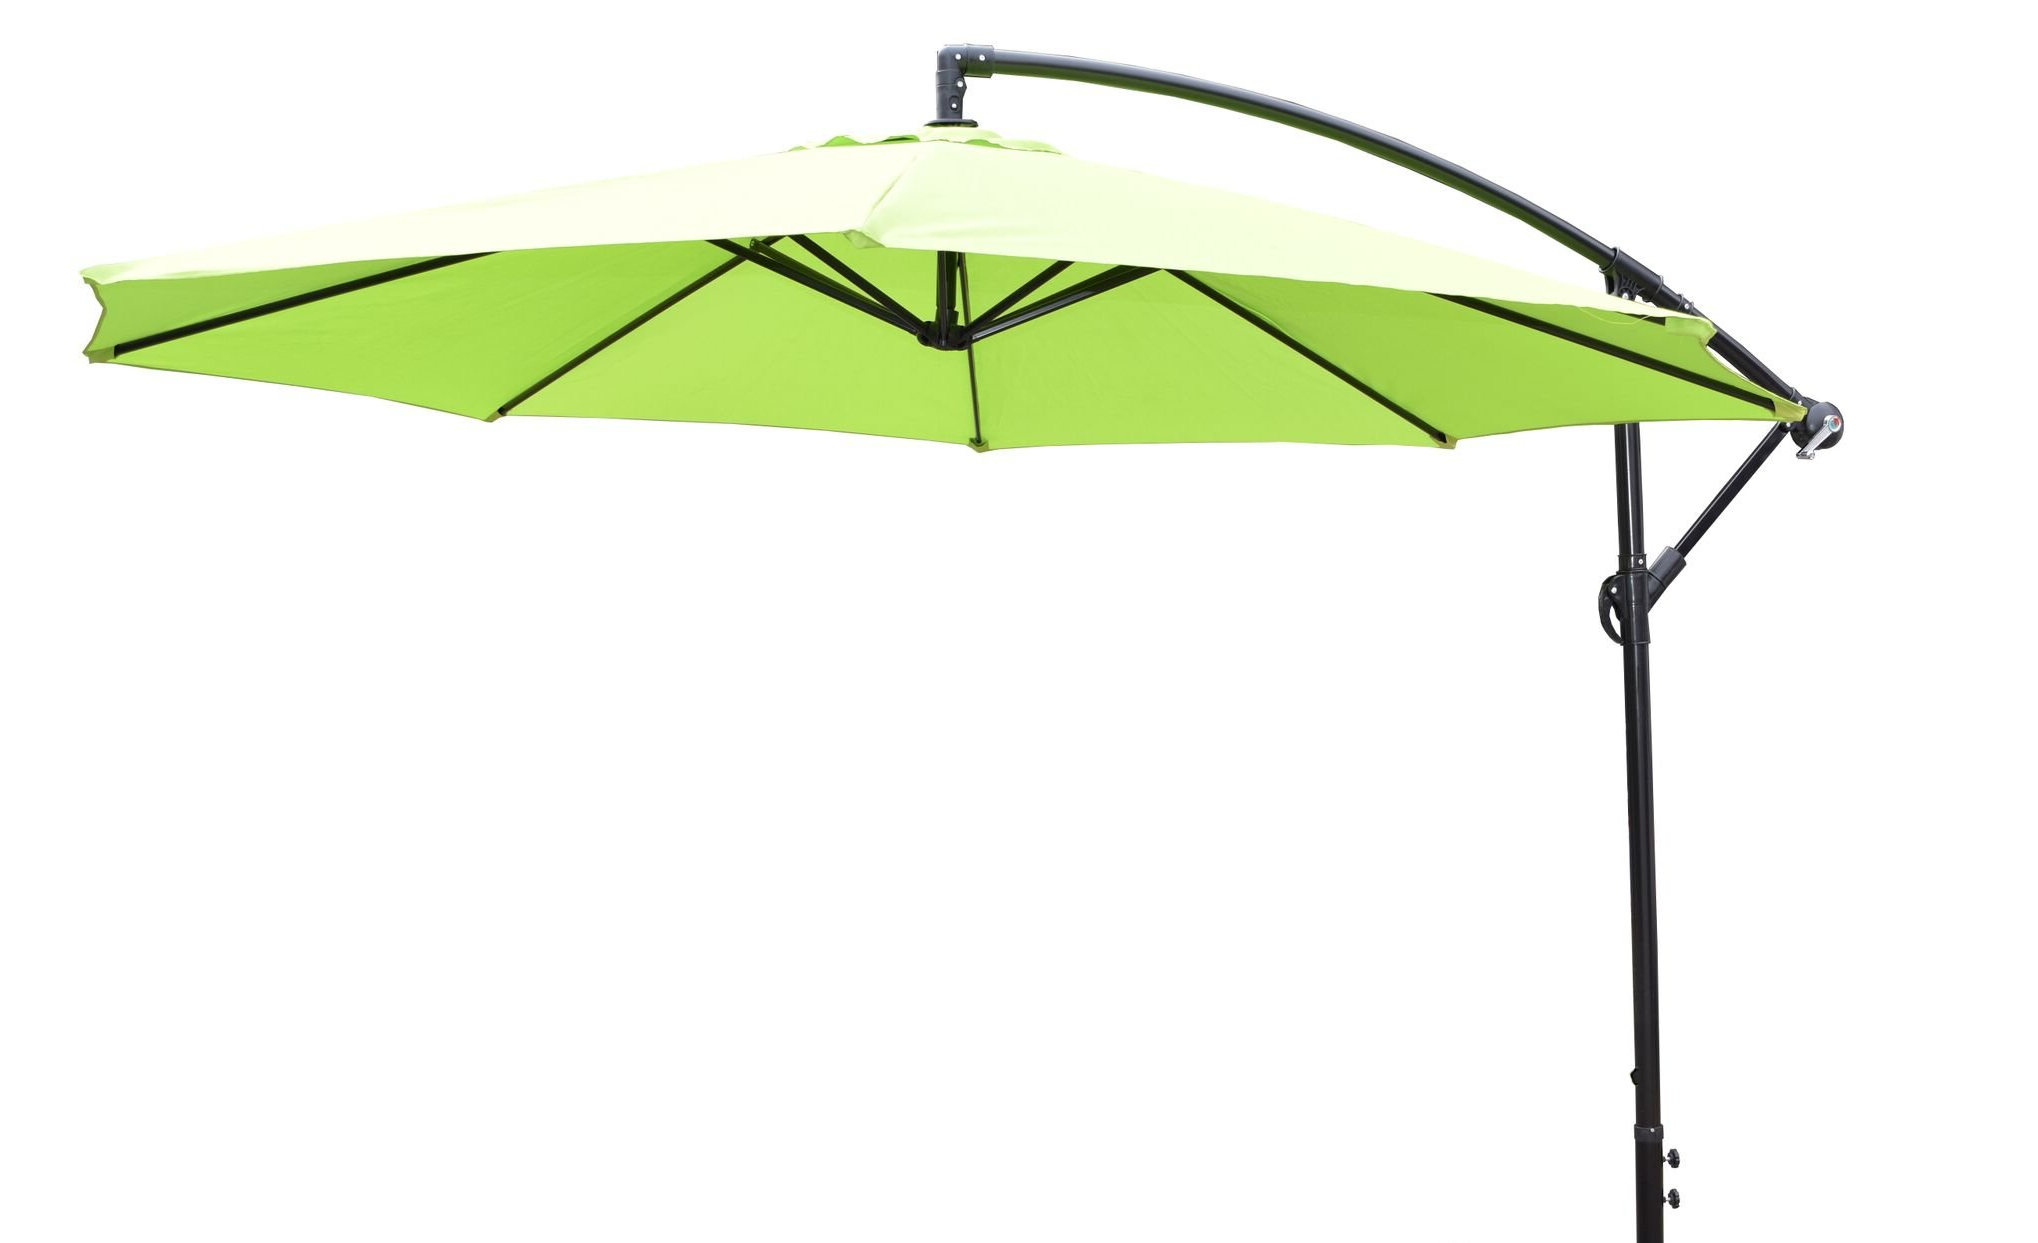 2019 Hilma Solar Cantilever Umbrellas In Auda 10' Cantilever Umbrella (View 1 of 20)